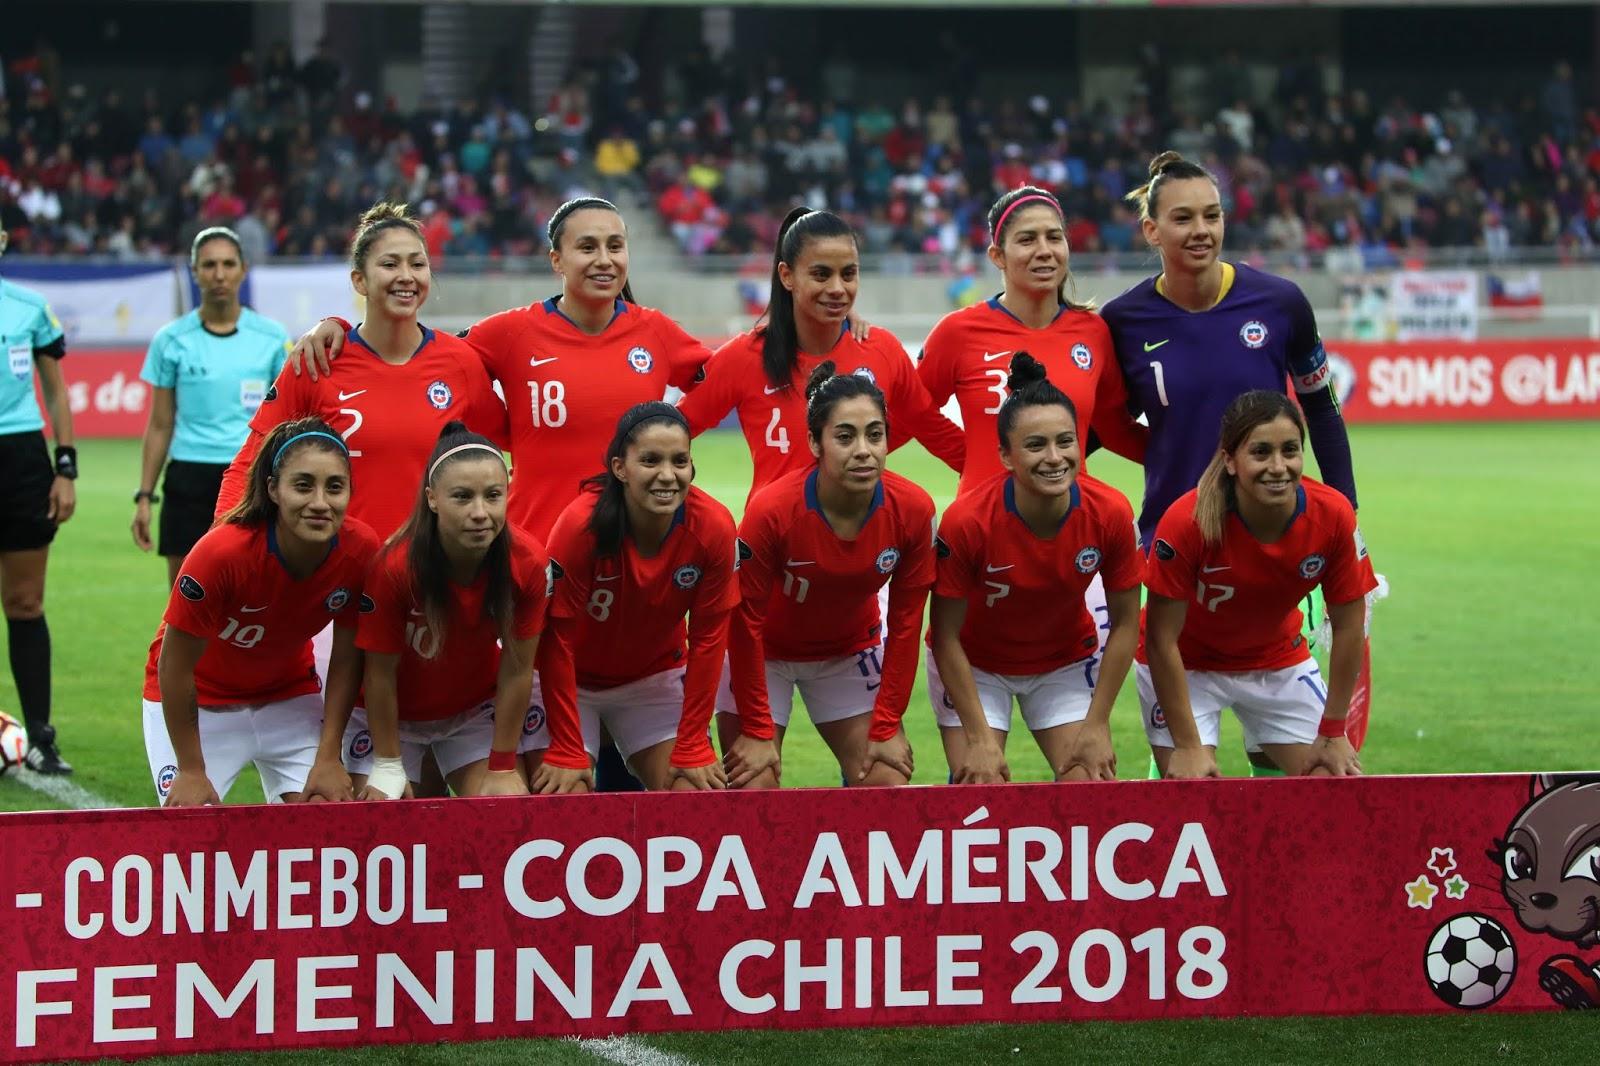 Formación de selección de Chile ante Colombia, Copa América Femenina 2018, 19 de abril